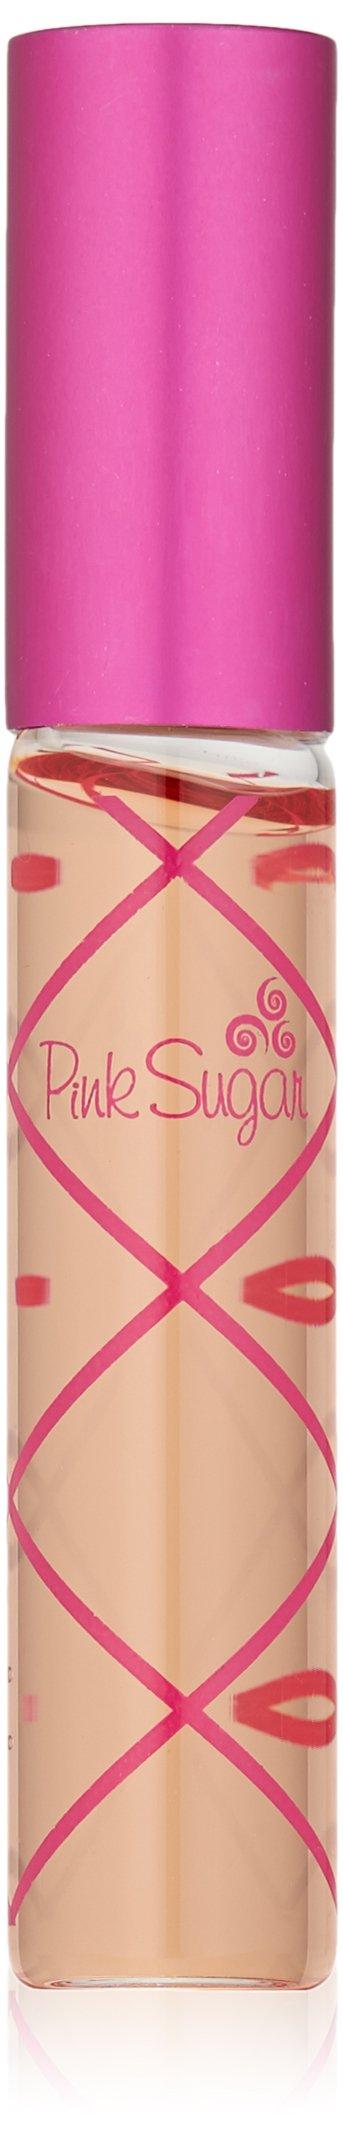 Pink Sugar Aquolina Roller Ball Eau De Toilette for Women, Travel Size, 0.34 Oz